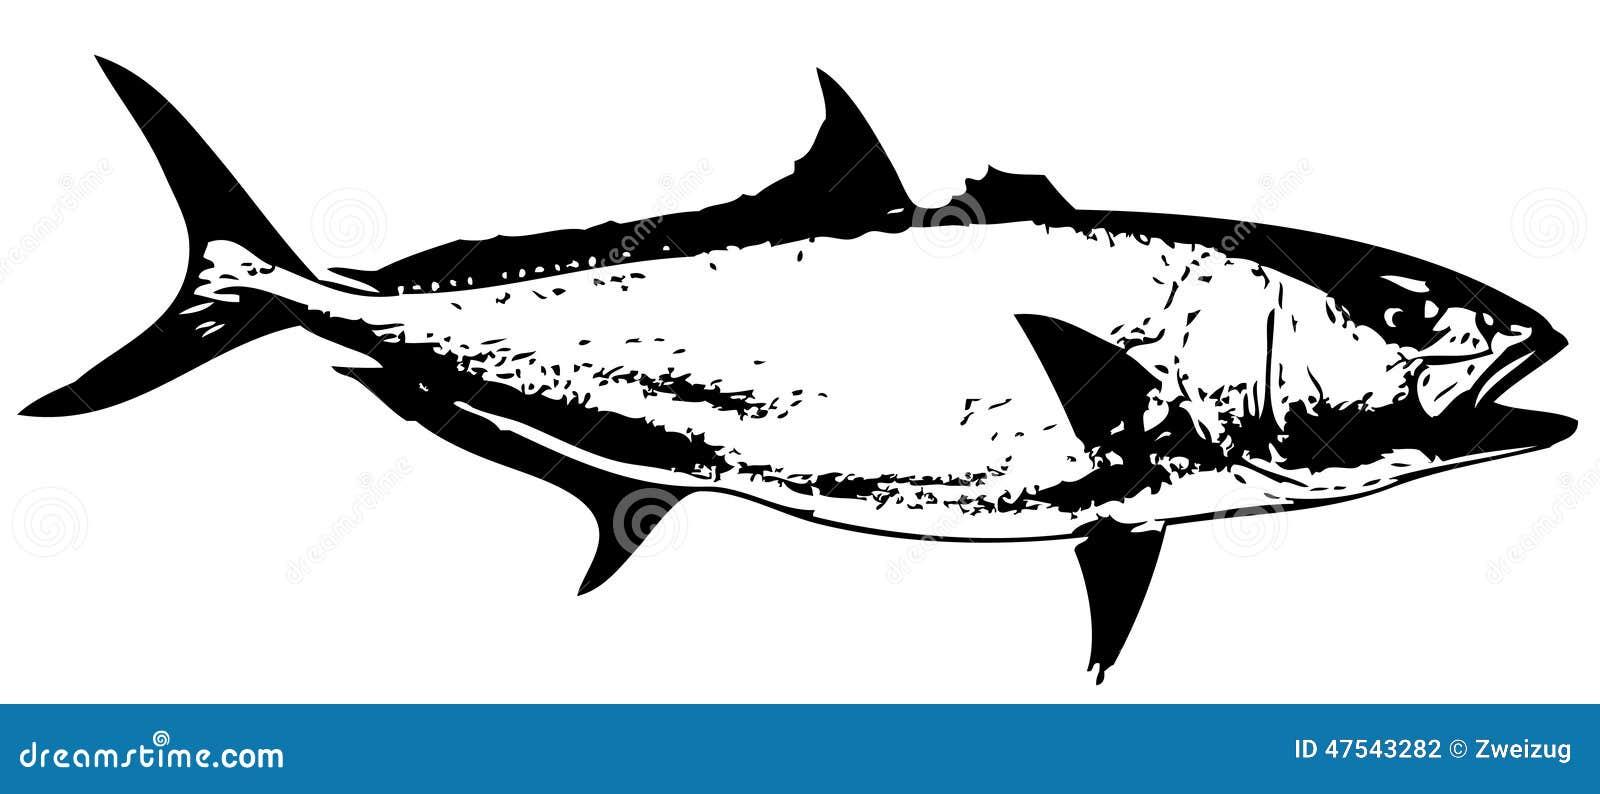 Amberjack Fish Vector Stock Vector Image 47543282